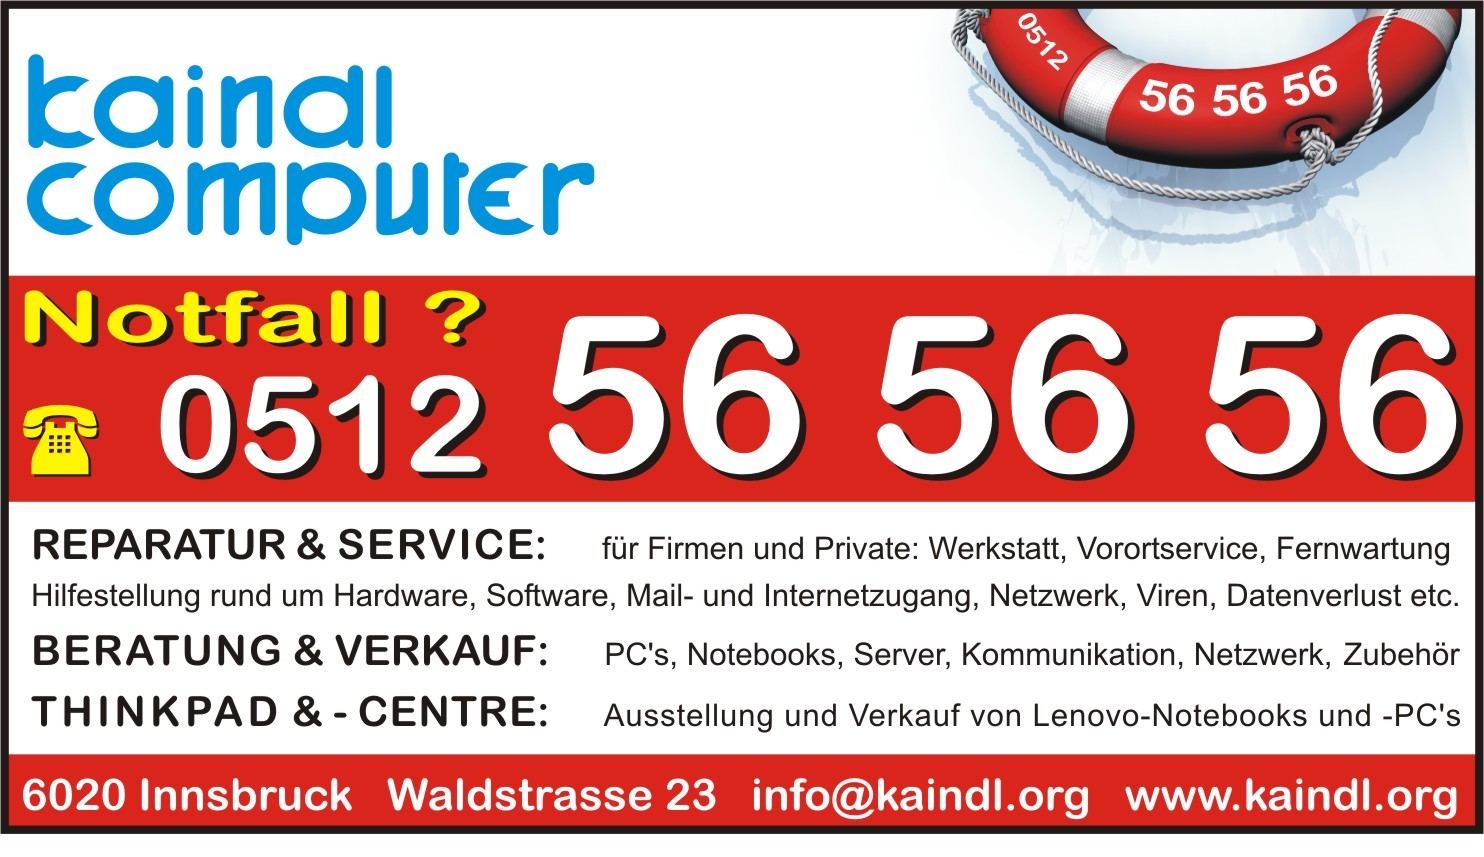 Kaindl Computer Watronic-Reparaturen Service Verkauf